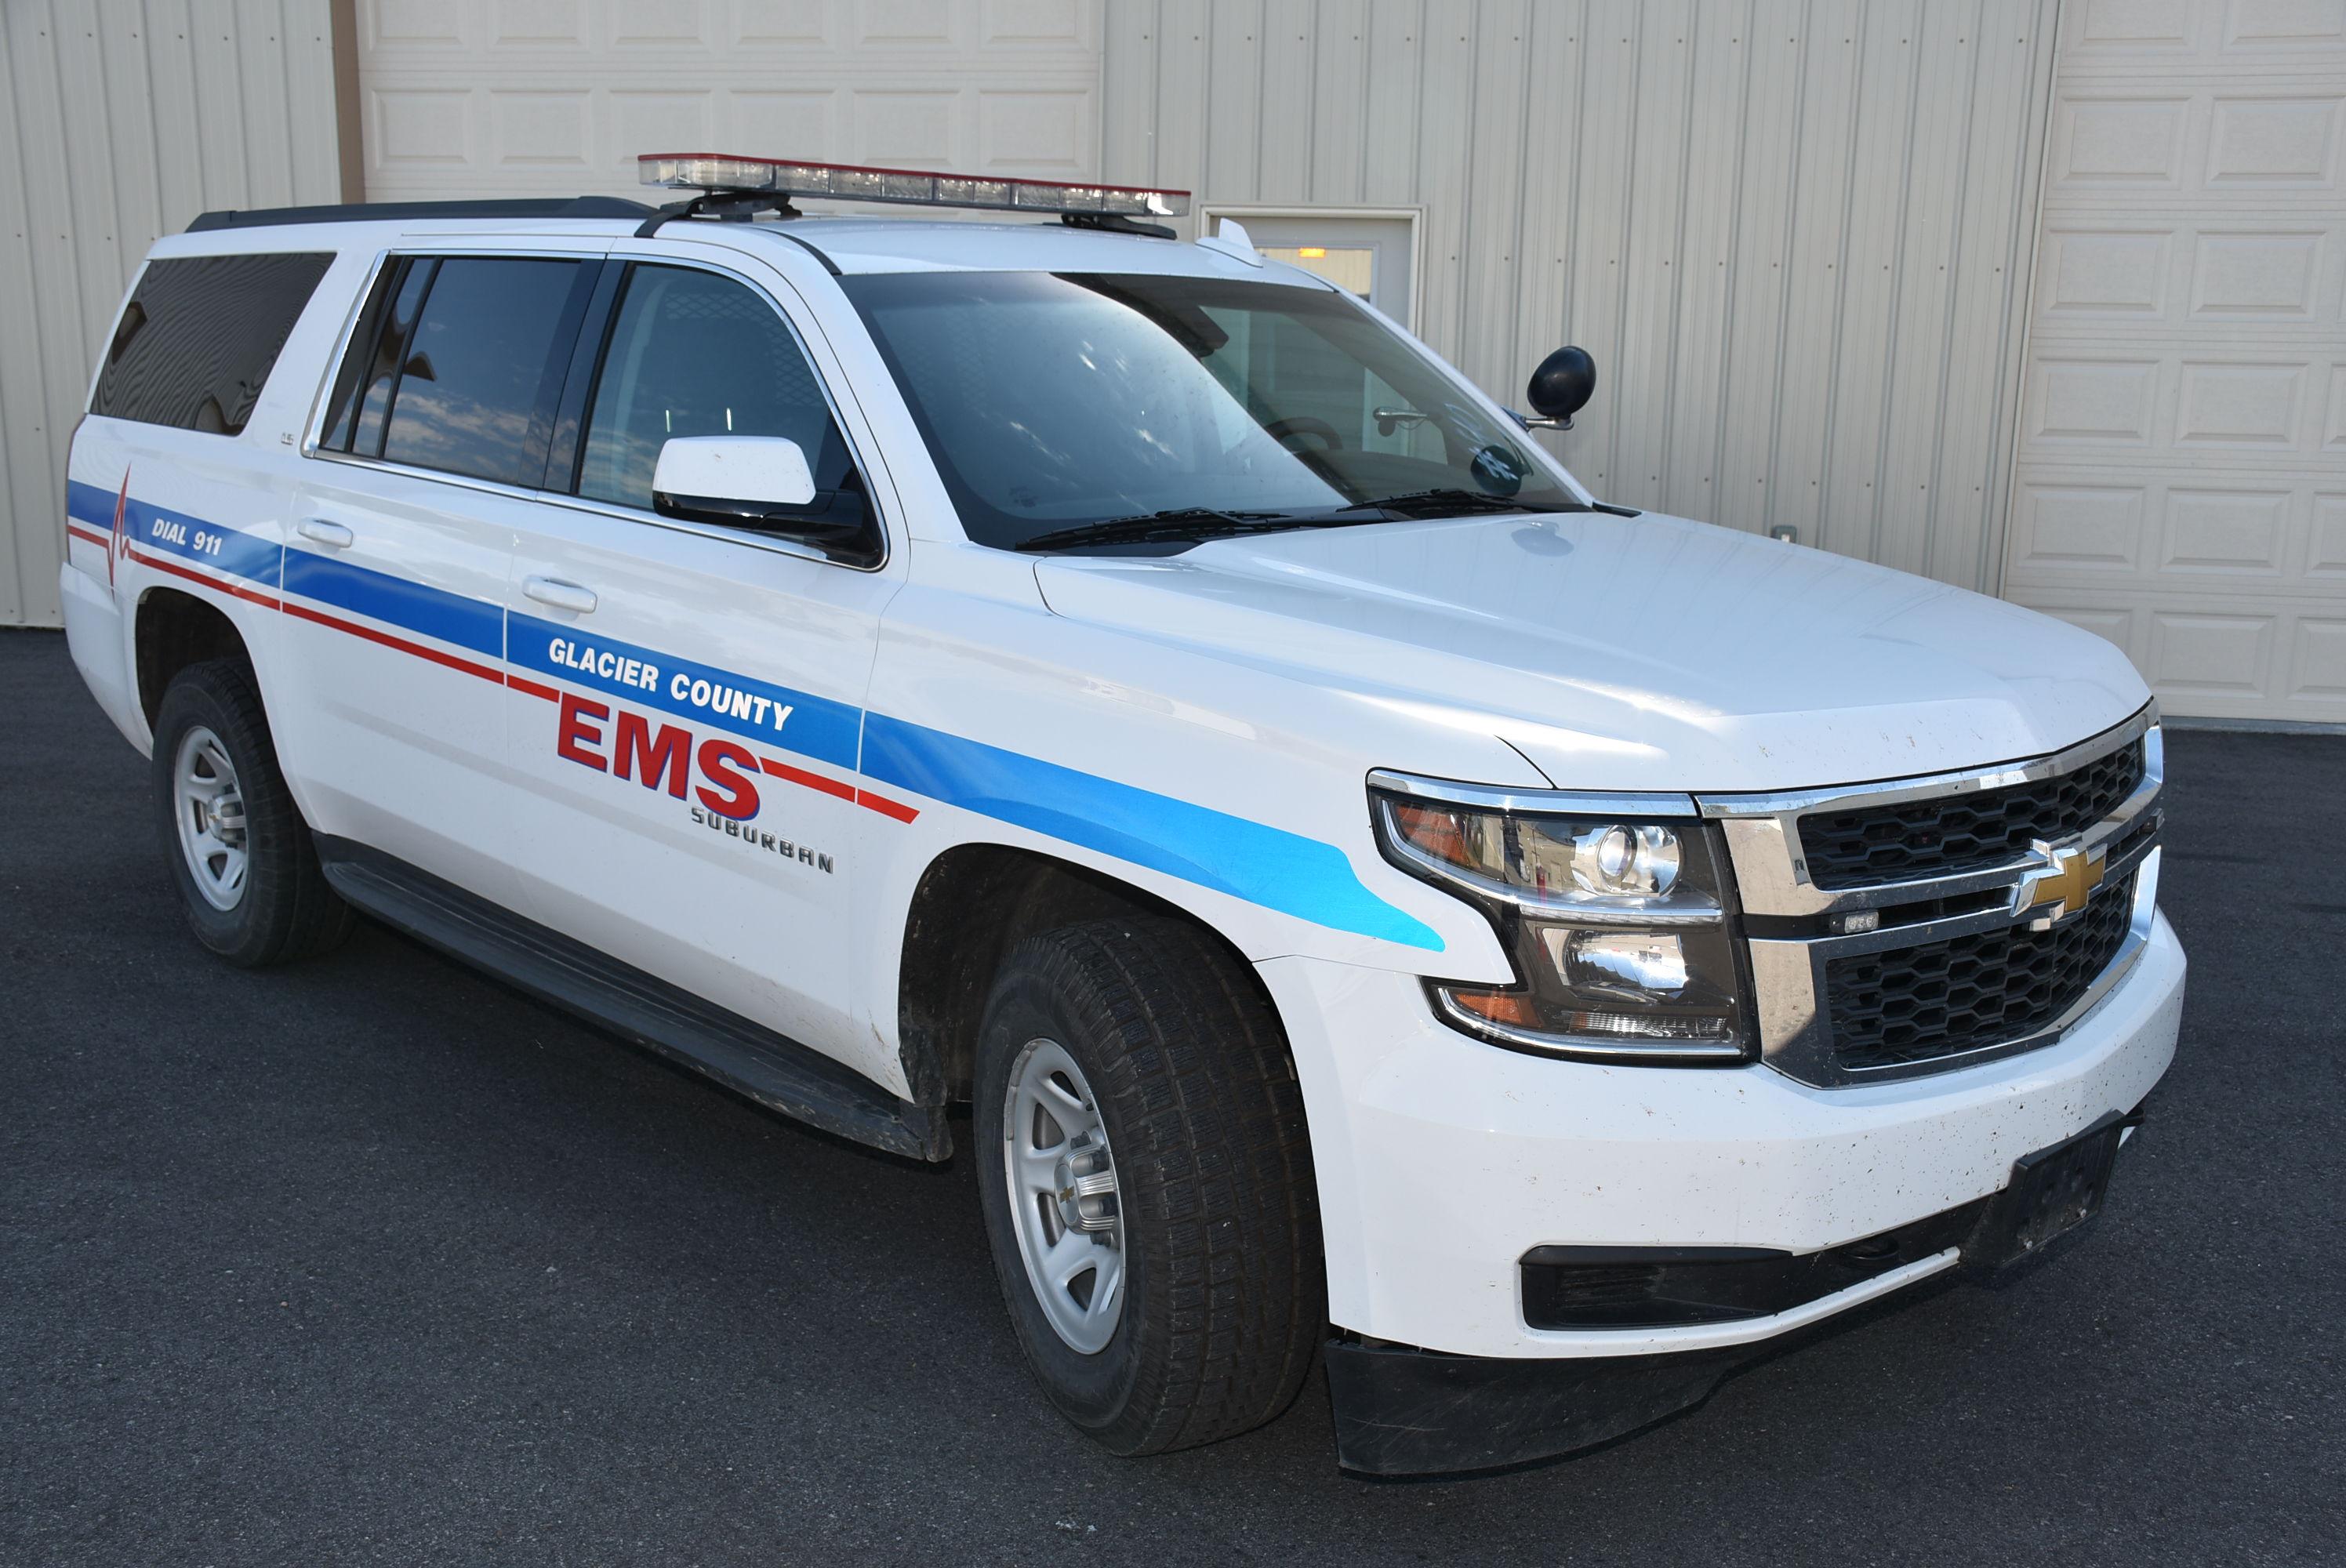 Municipal Vehicle online Auction 7/23 image 1